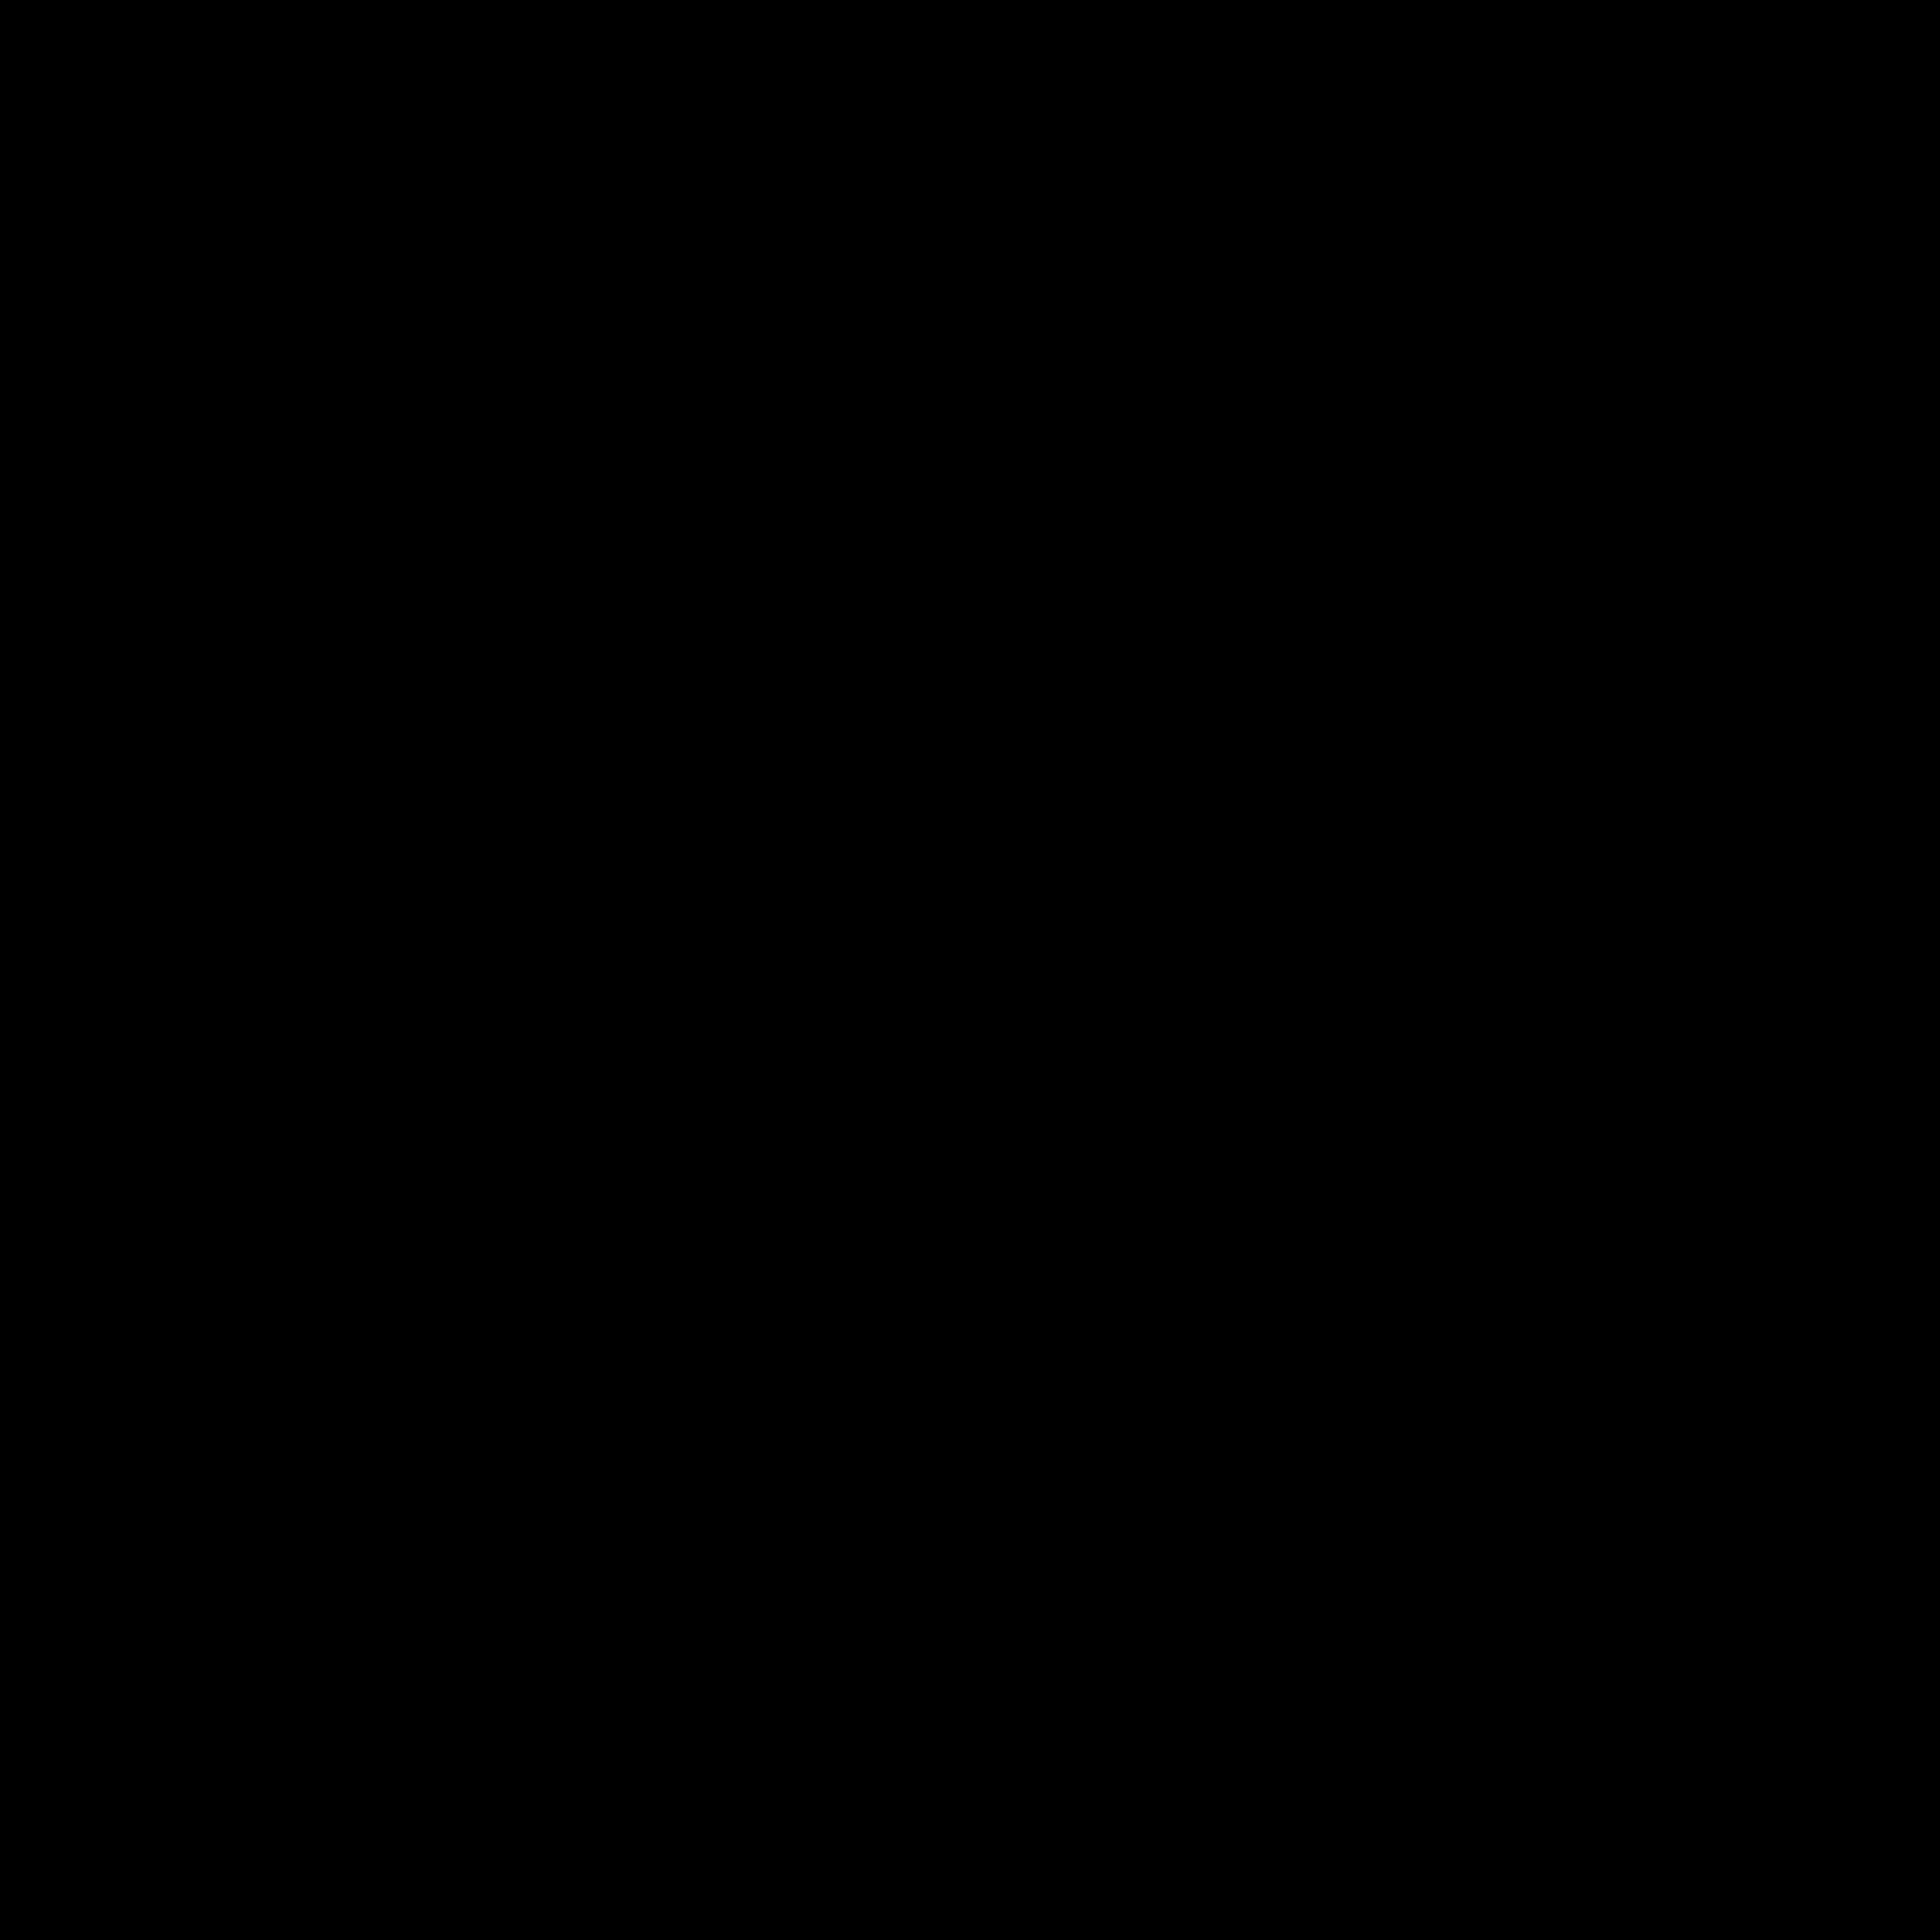 Celtic Serch bythol